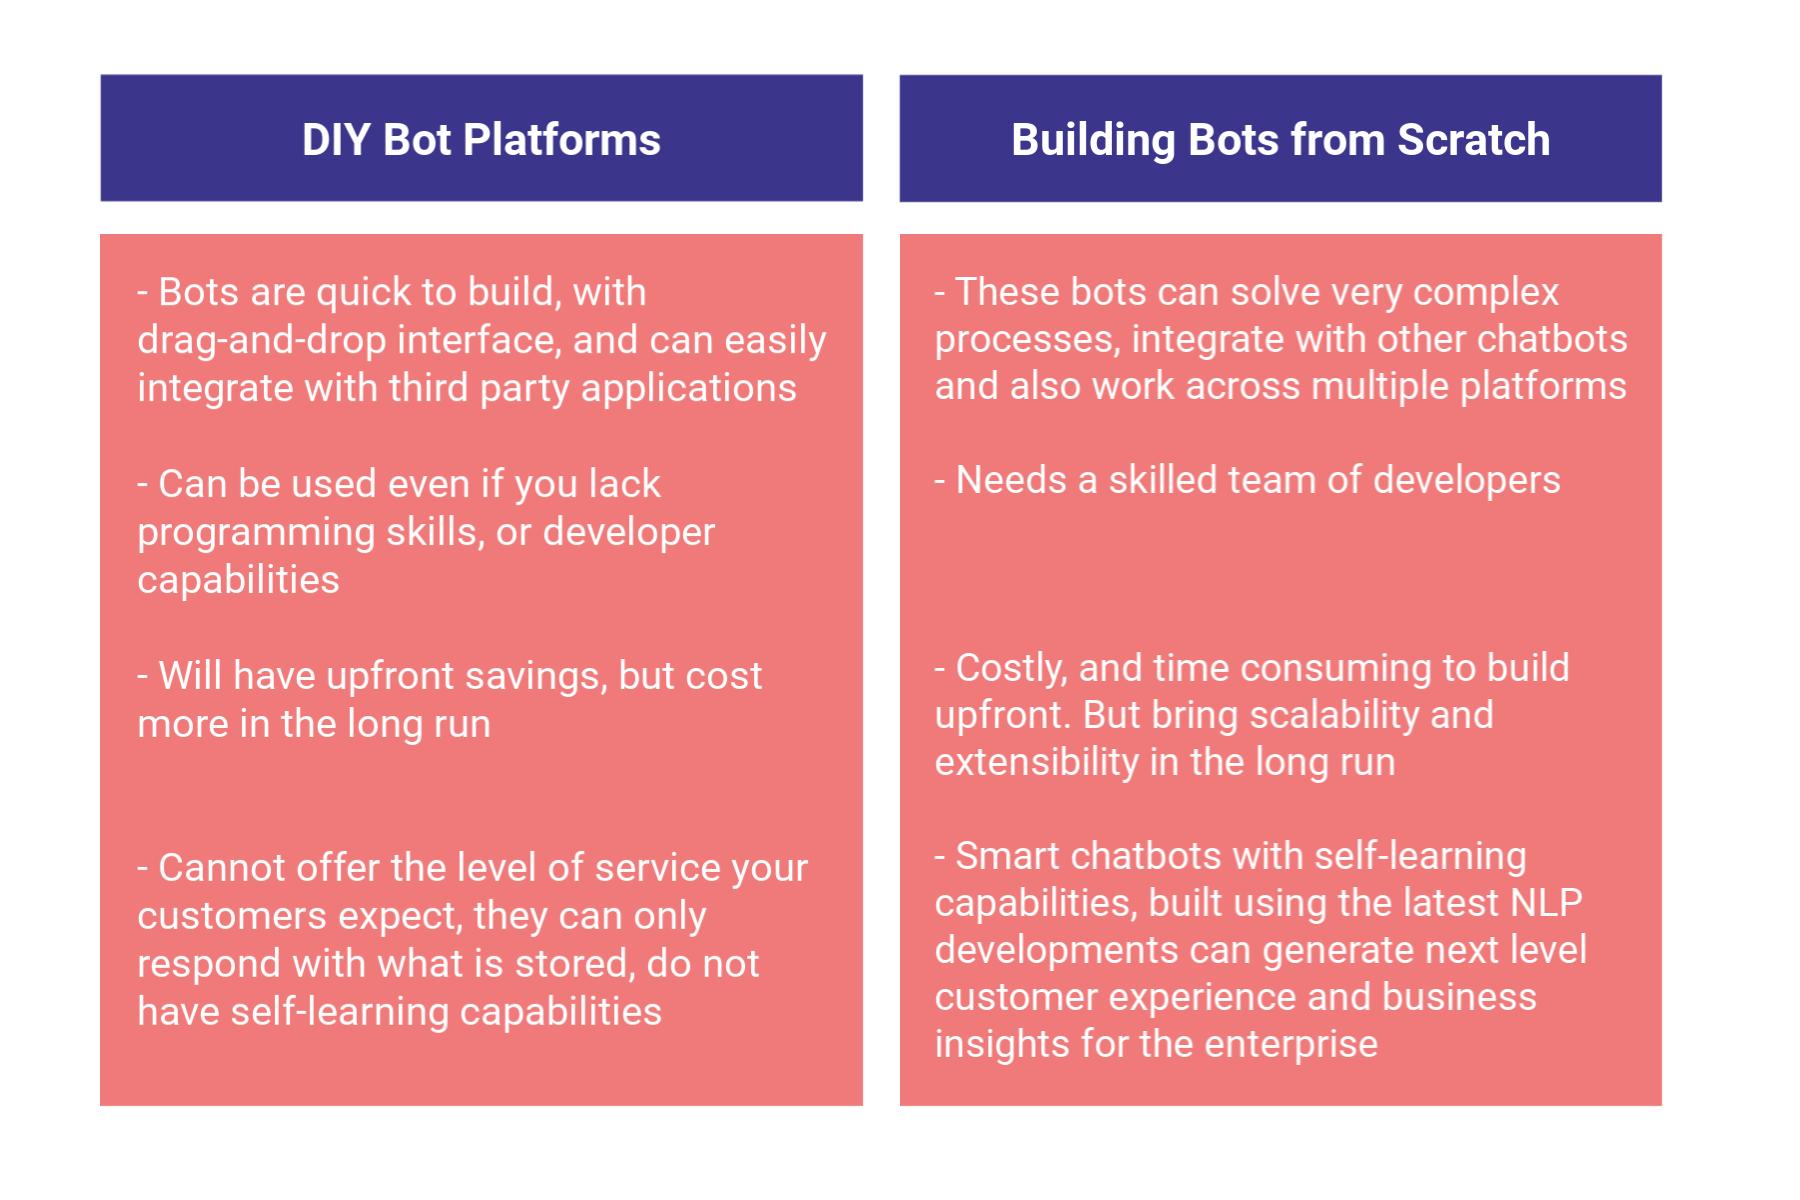 DIY Bot Platforms vs Building from scratch